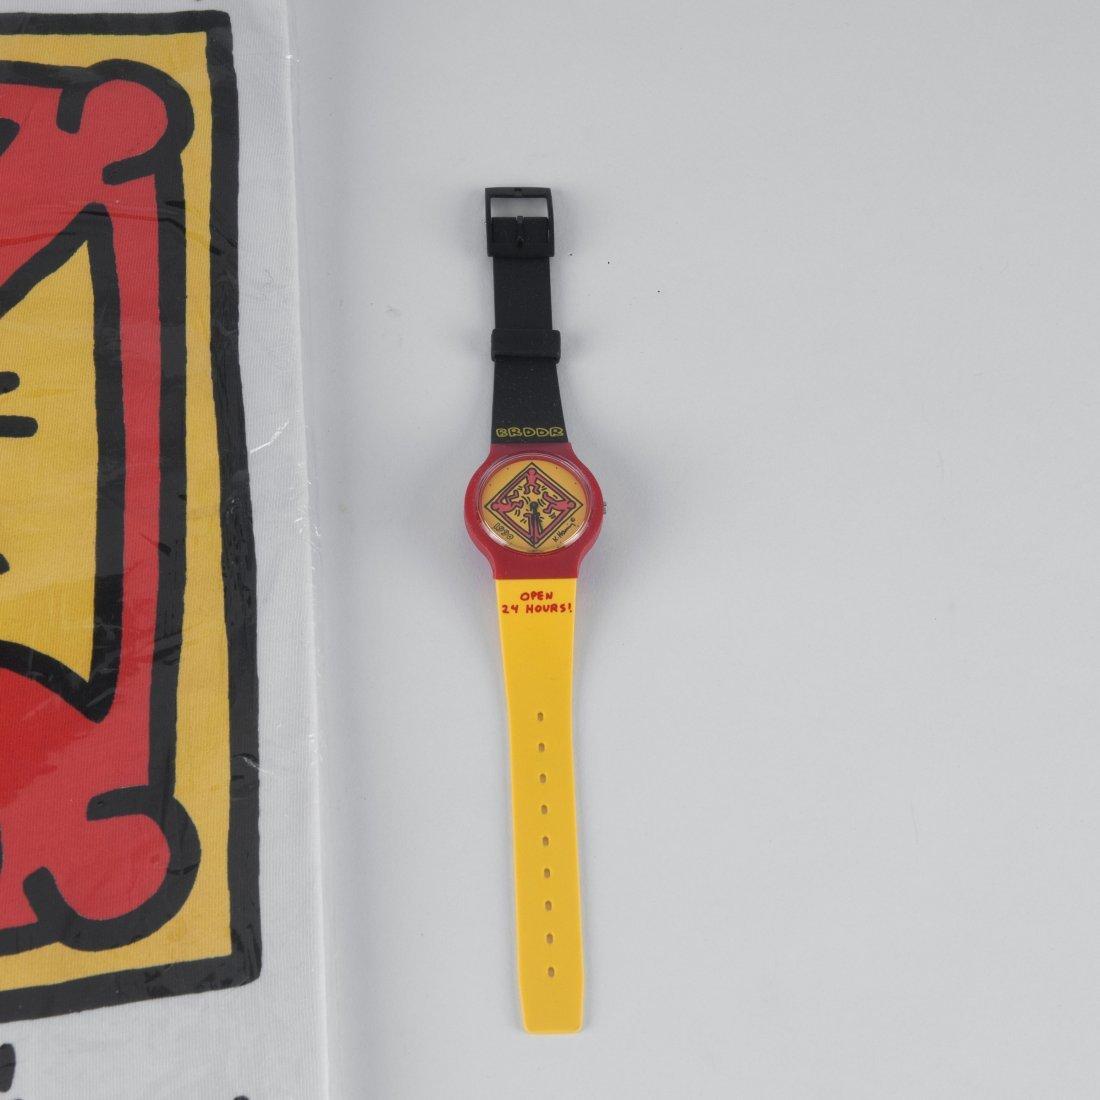 'BRDDR' watch and T shirt, 1990 - 2